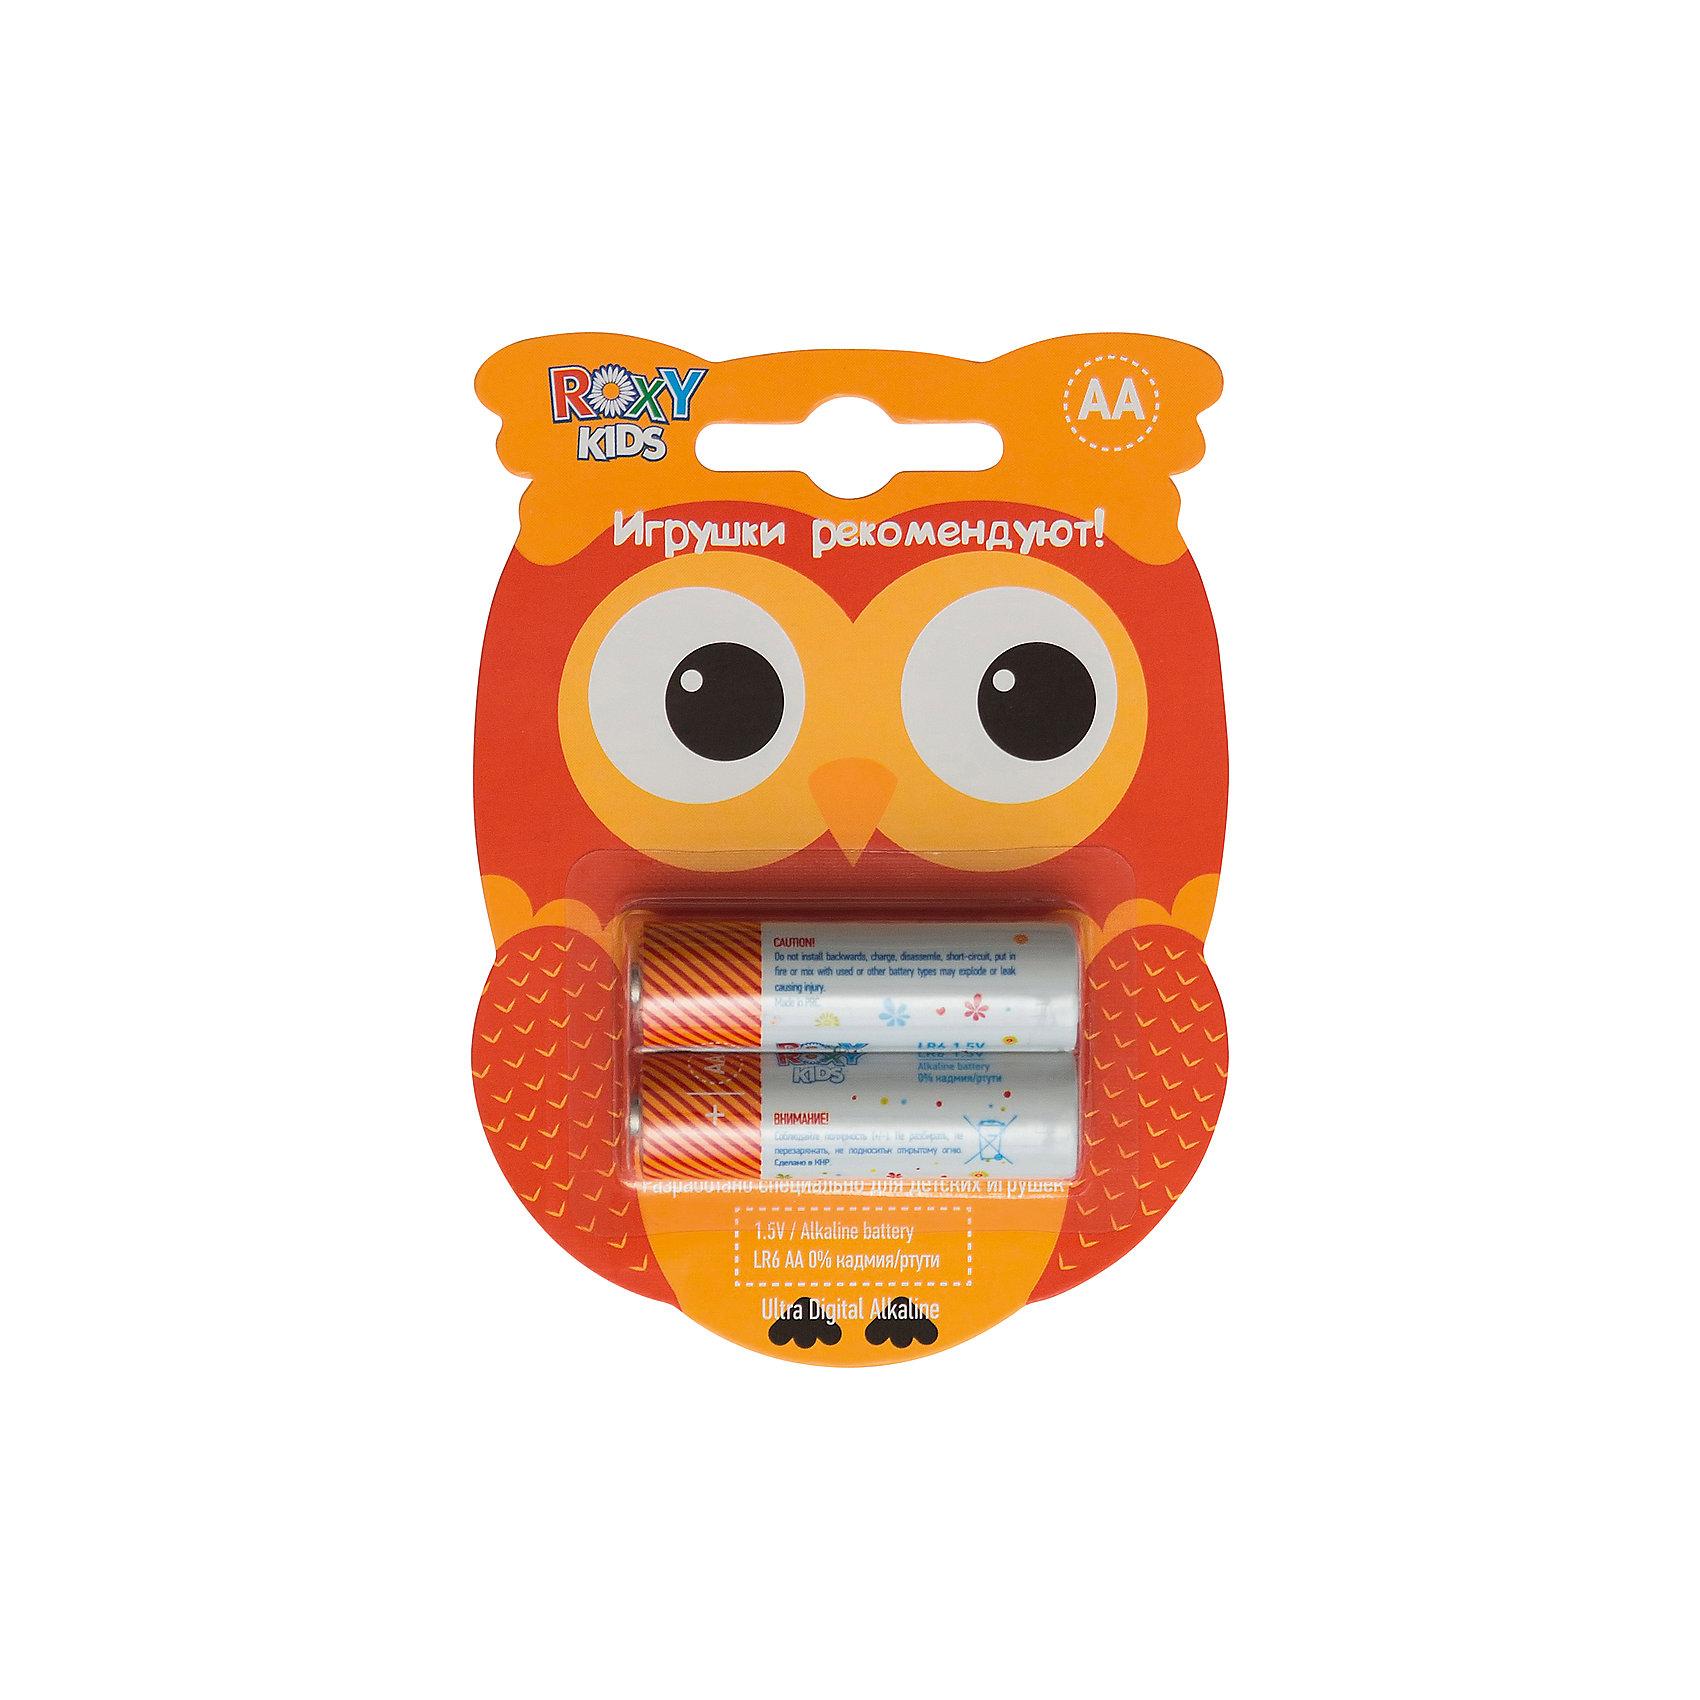 Roxy-Kids Батарейки для игрушек, тип АА, 2 шт., Roxy-kids roxy kids круг для купания kengu